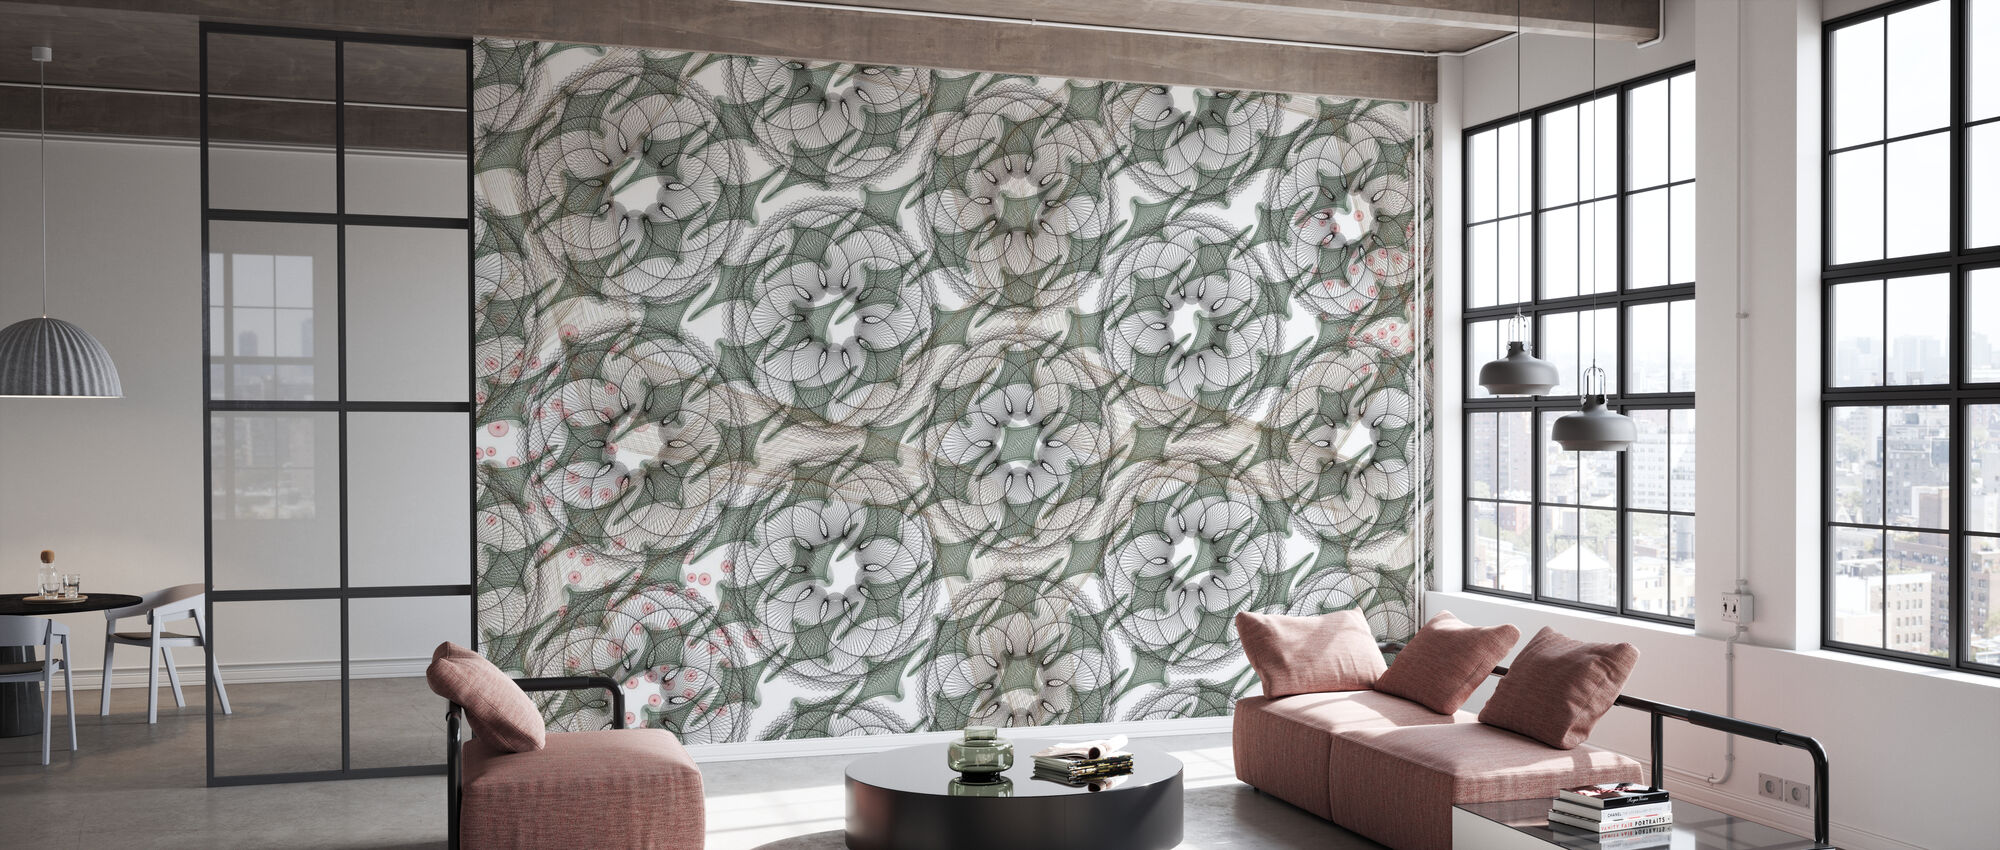 Timewinder - Wallpaper - Office